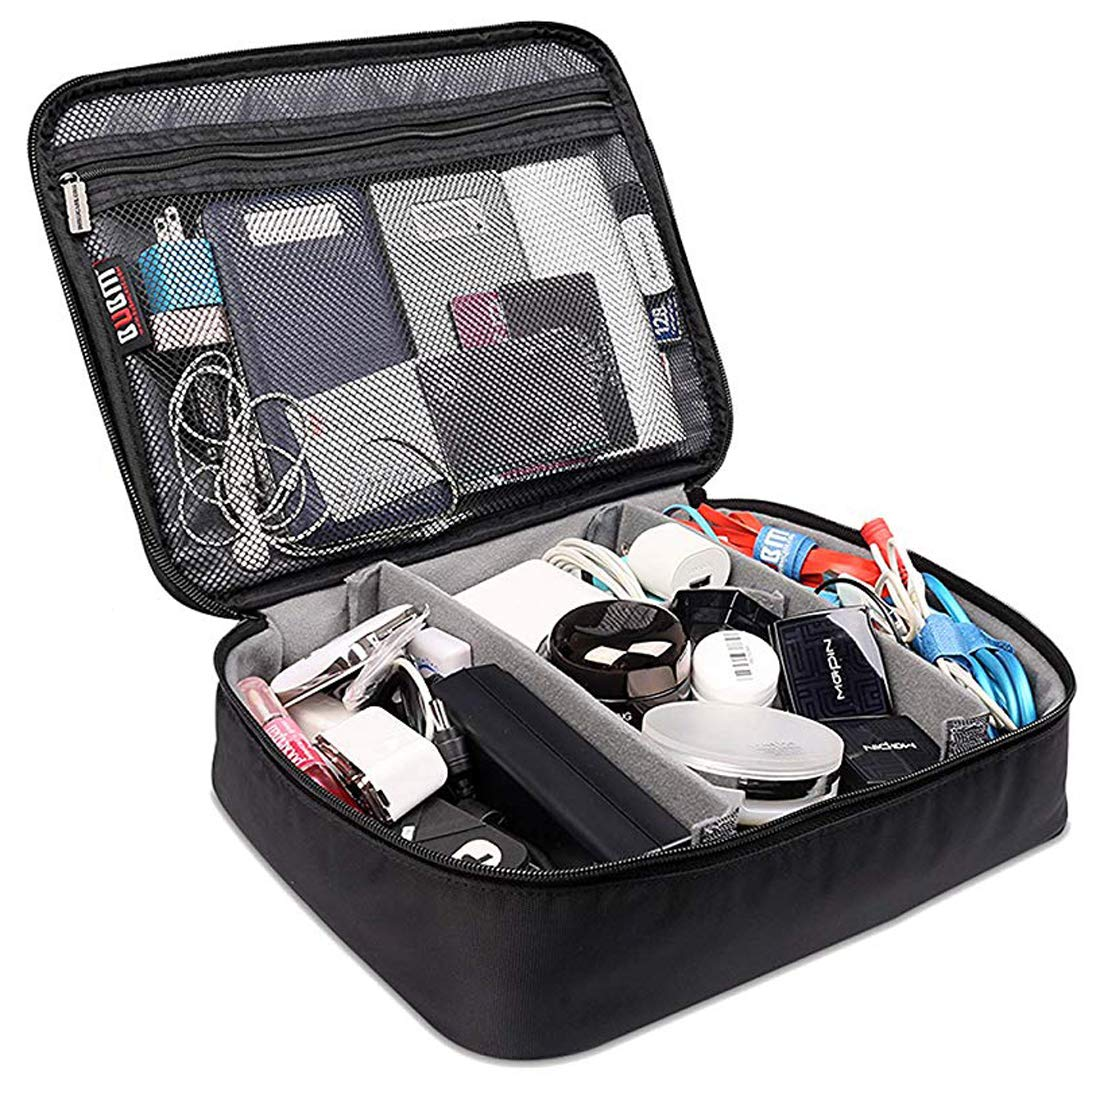 Amazon.com: BUBM-Neck-Bag2: Electronics